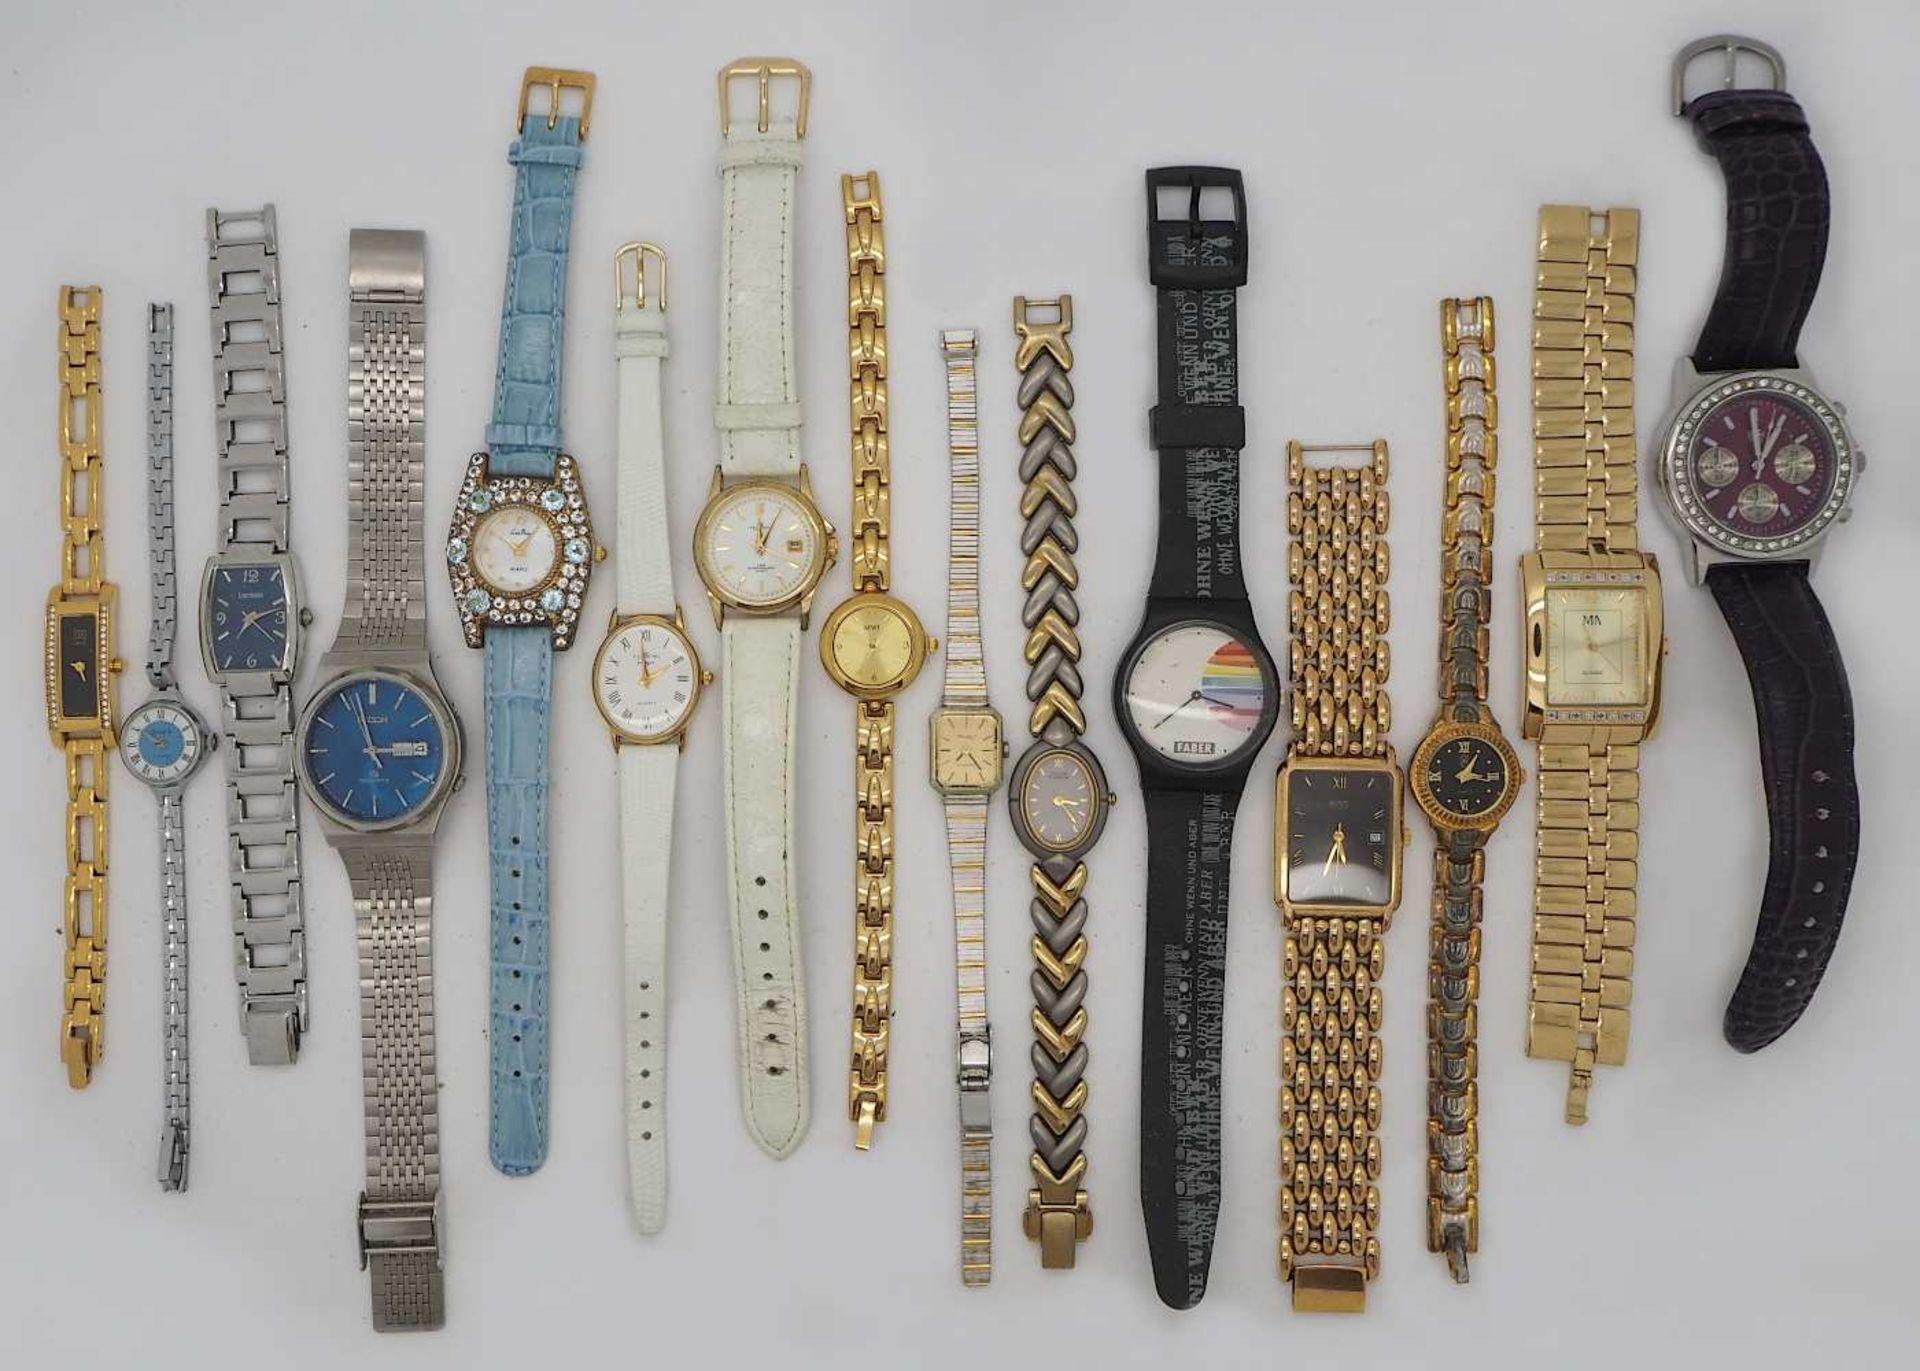 1 Konv. Armbanduhren Metall, Leder u.a. Asp./ Gsp.